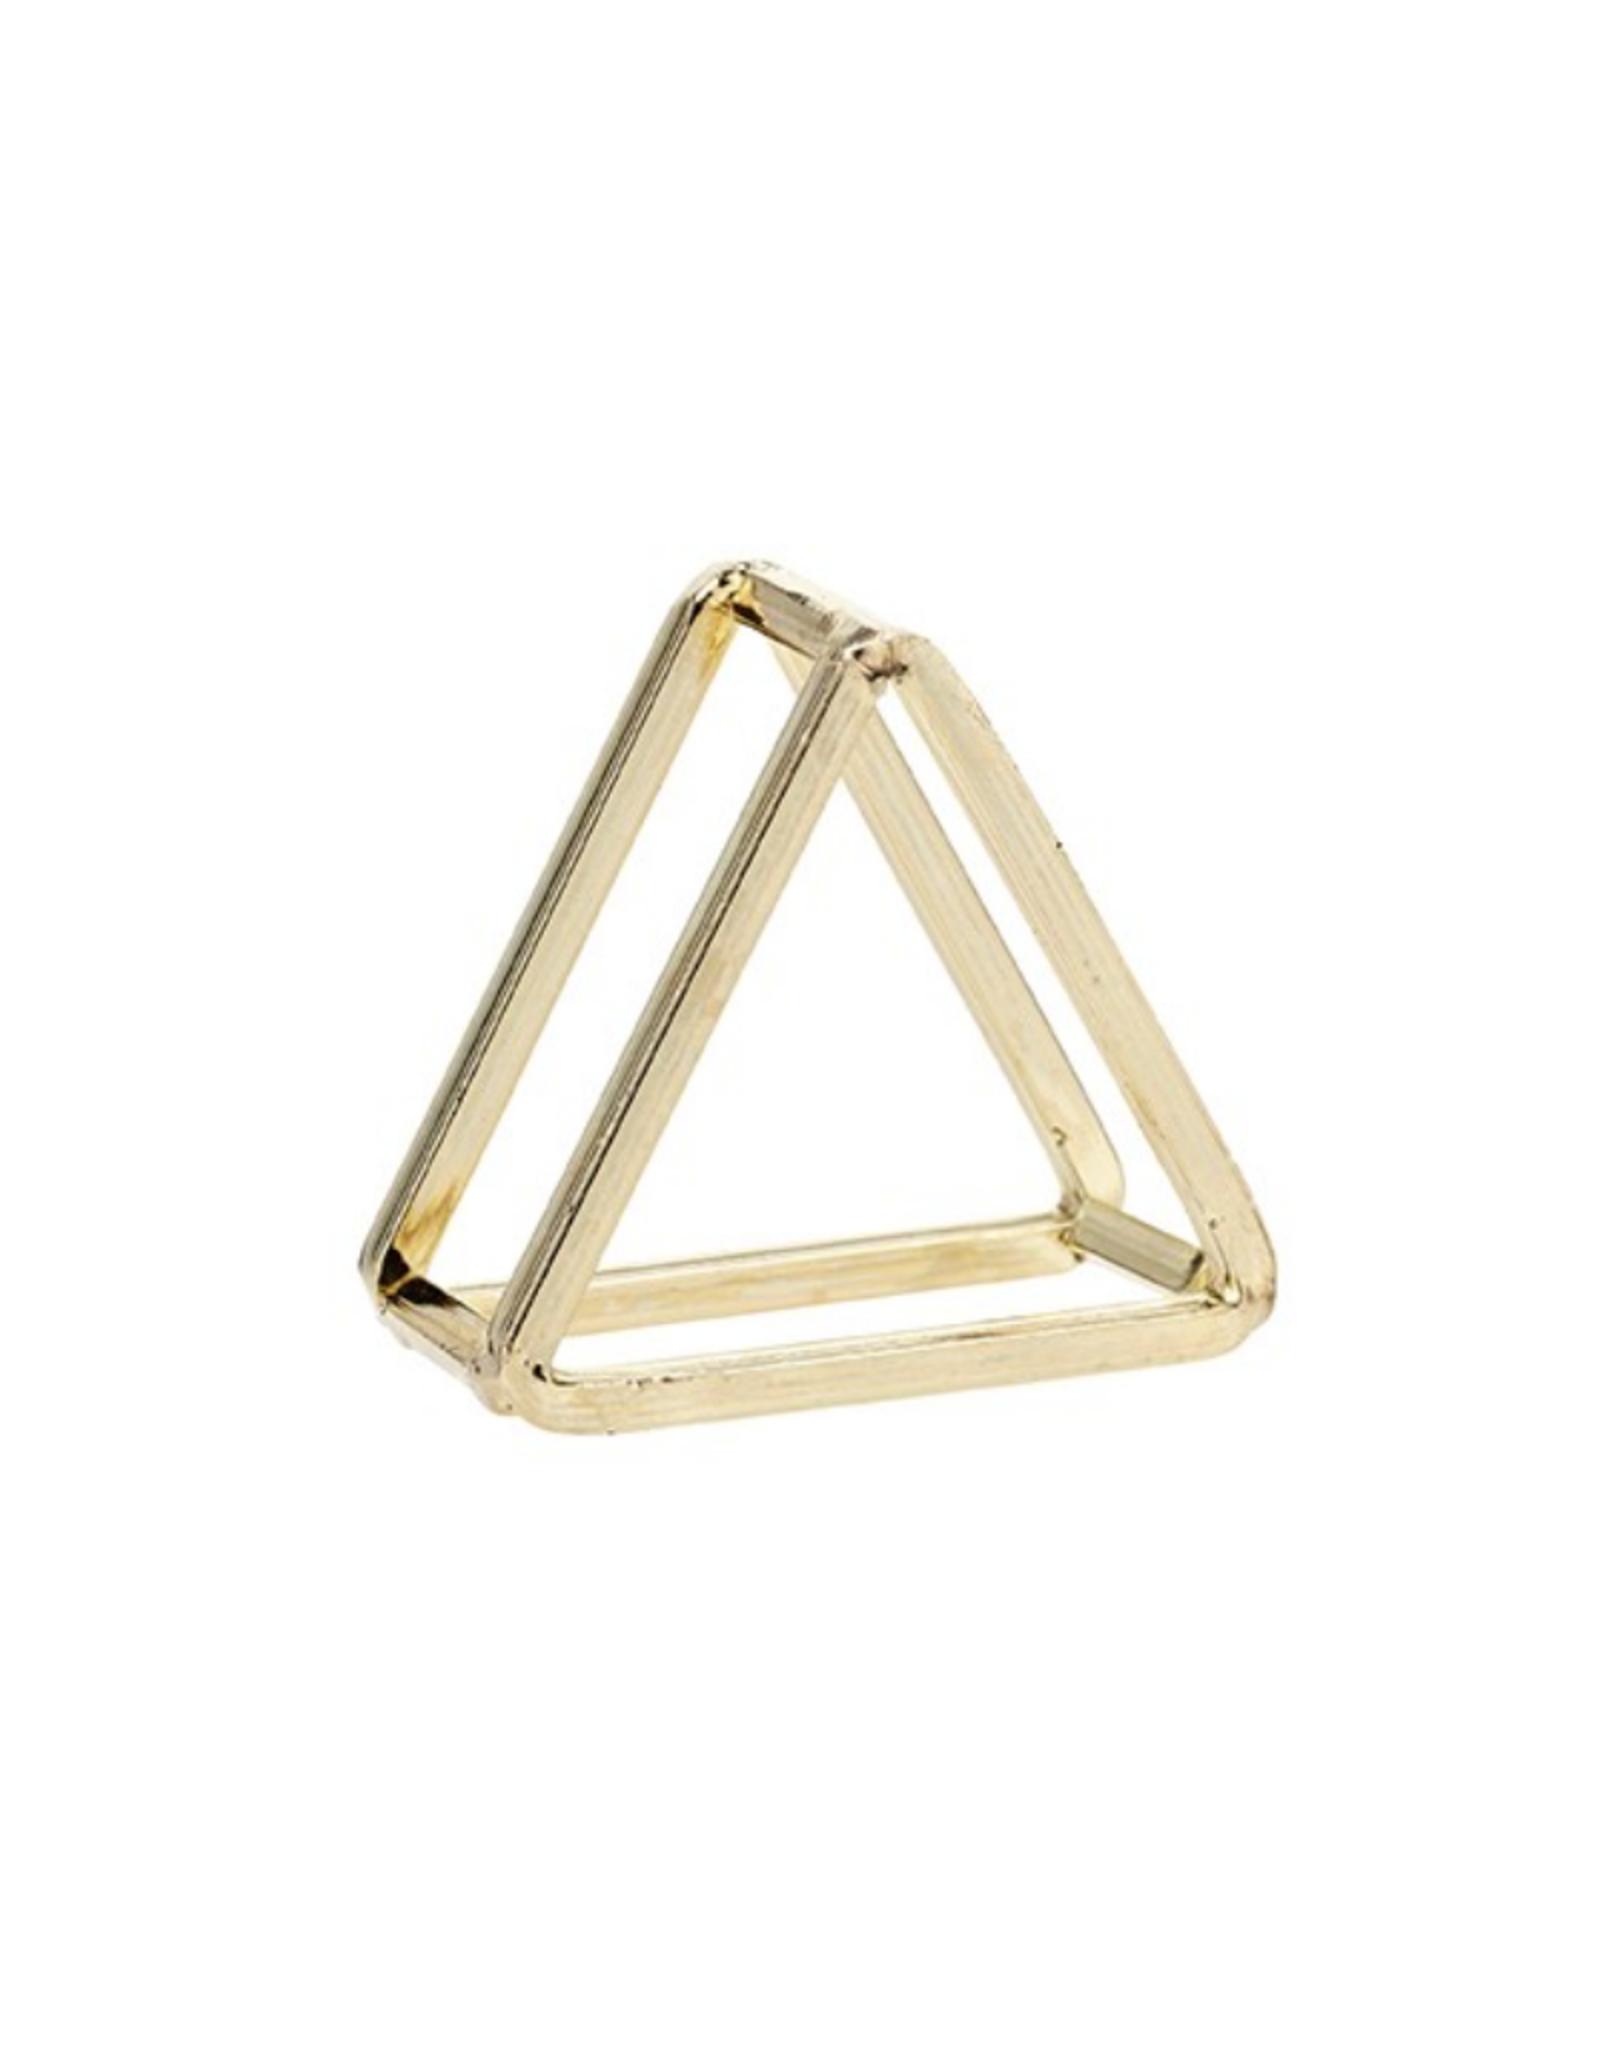 Harman Anneau de serviette triangulaire or